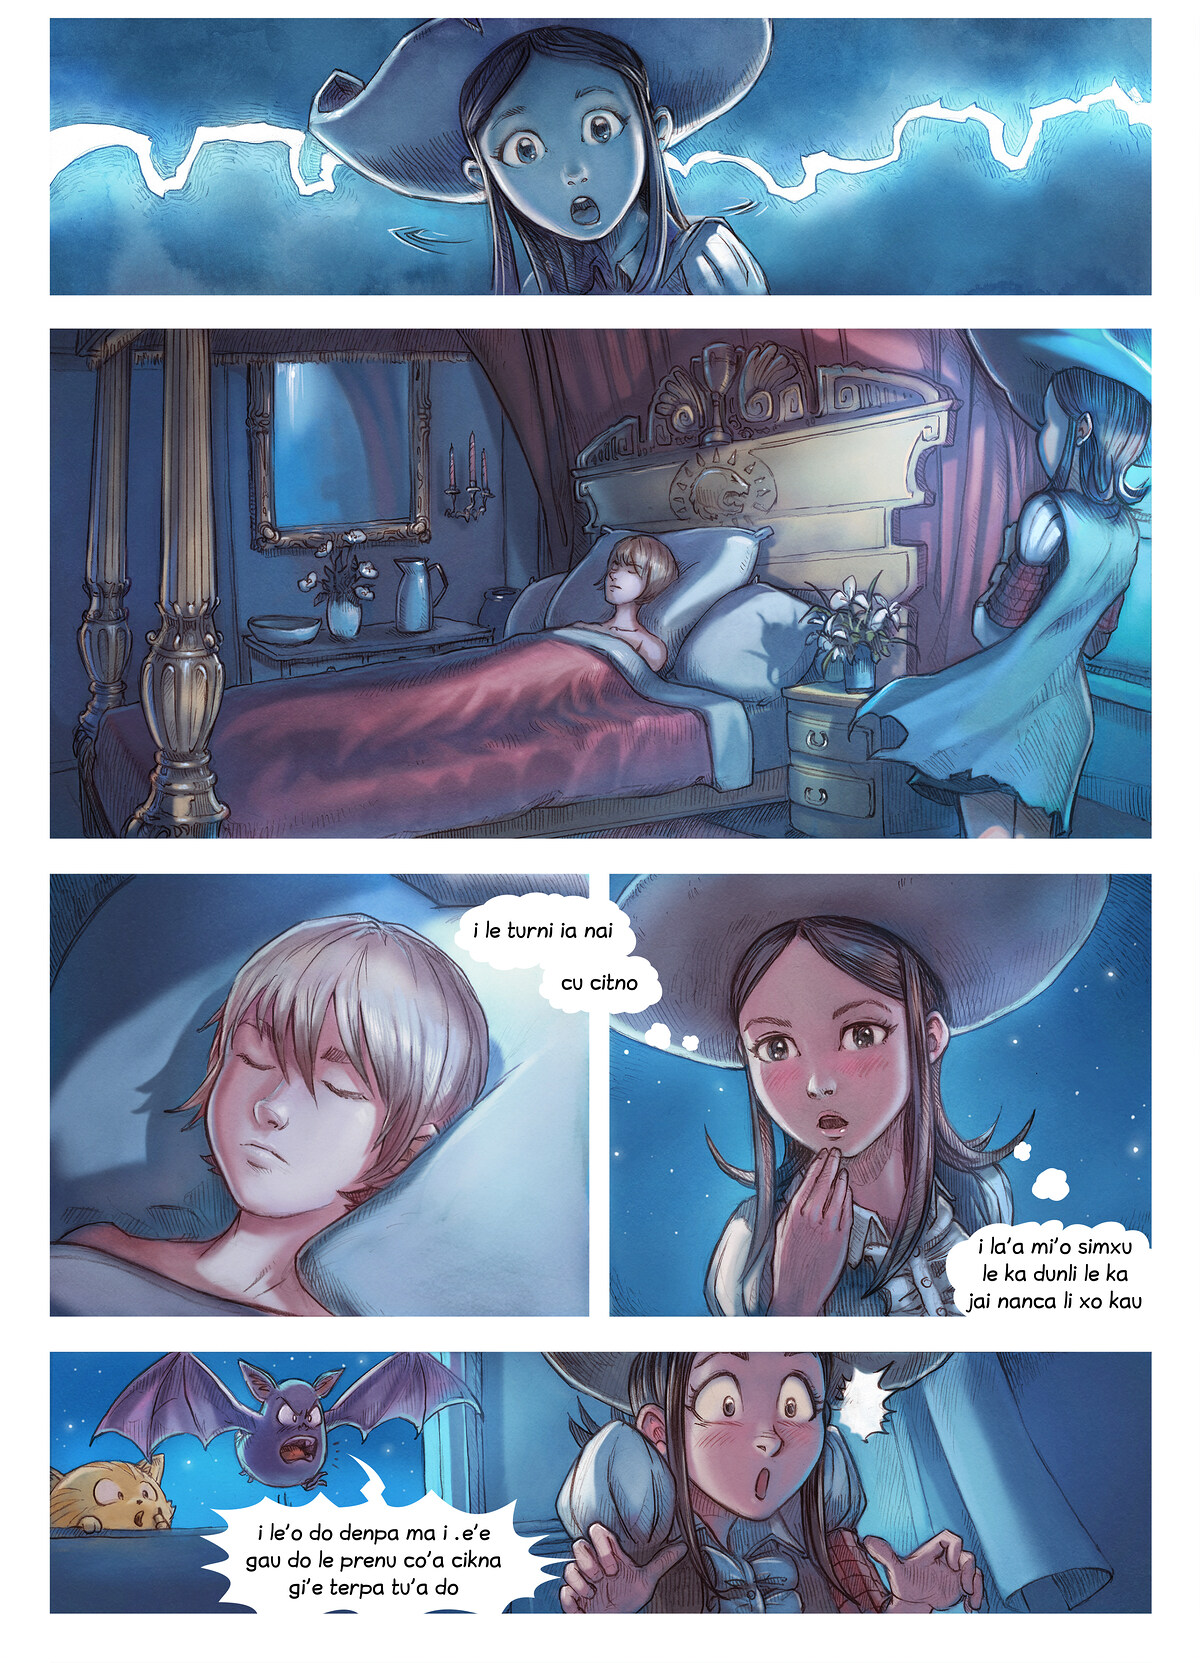 i 11 mo'o lisri le te makfa pe la kalsa, Page 4